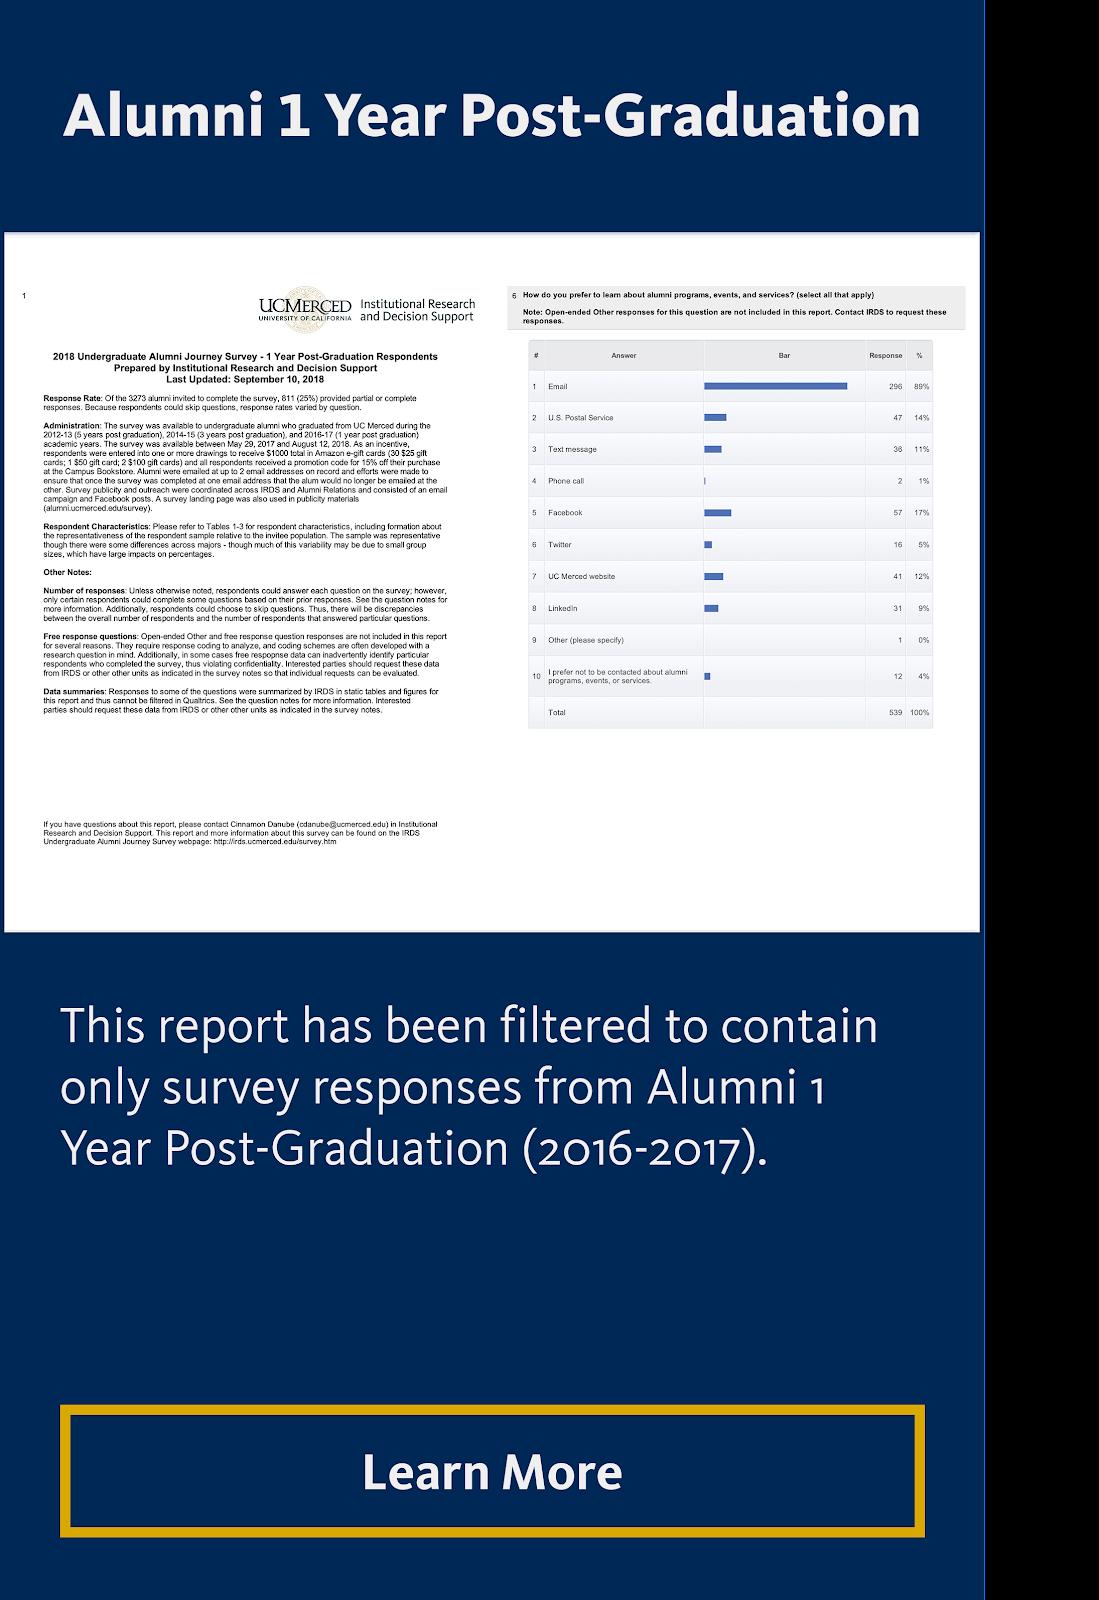 2018 Alumni 1 Year Post-Graduation